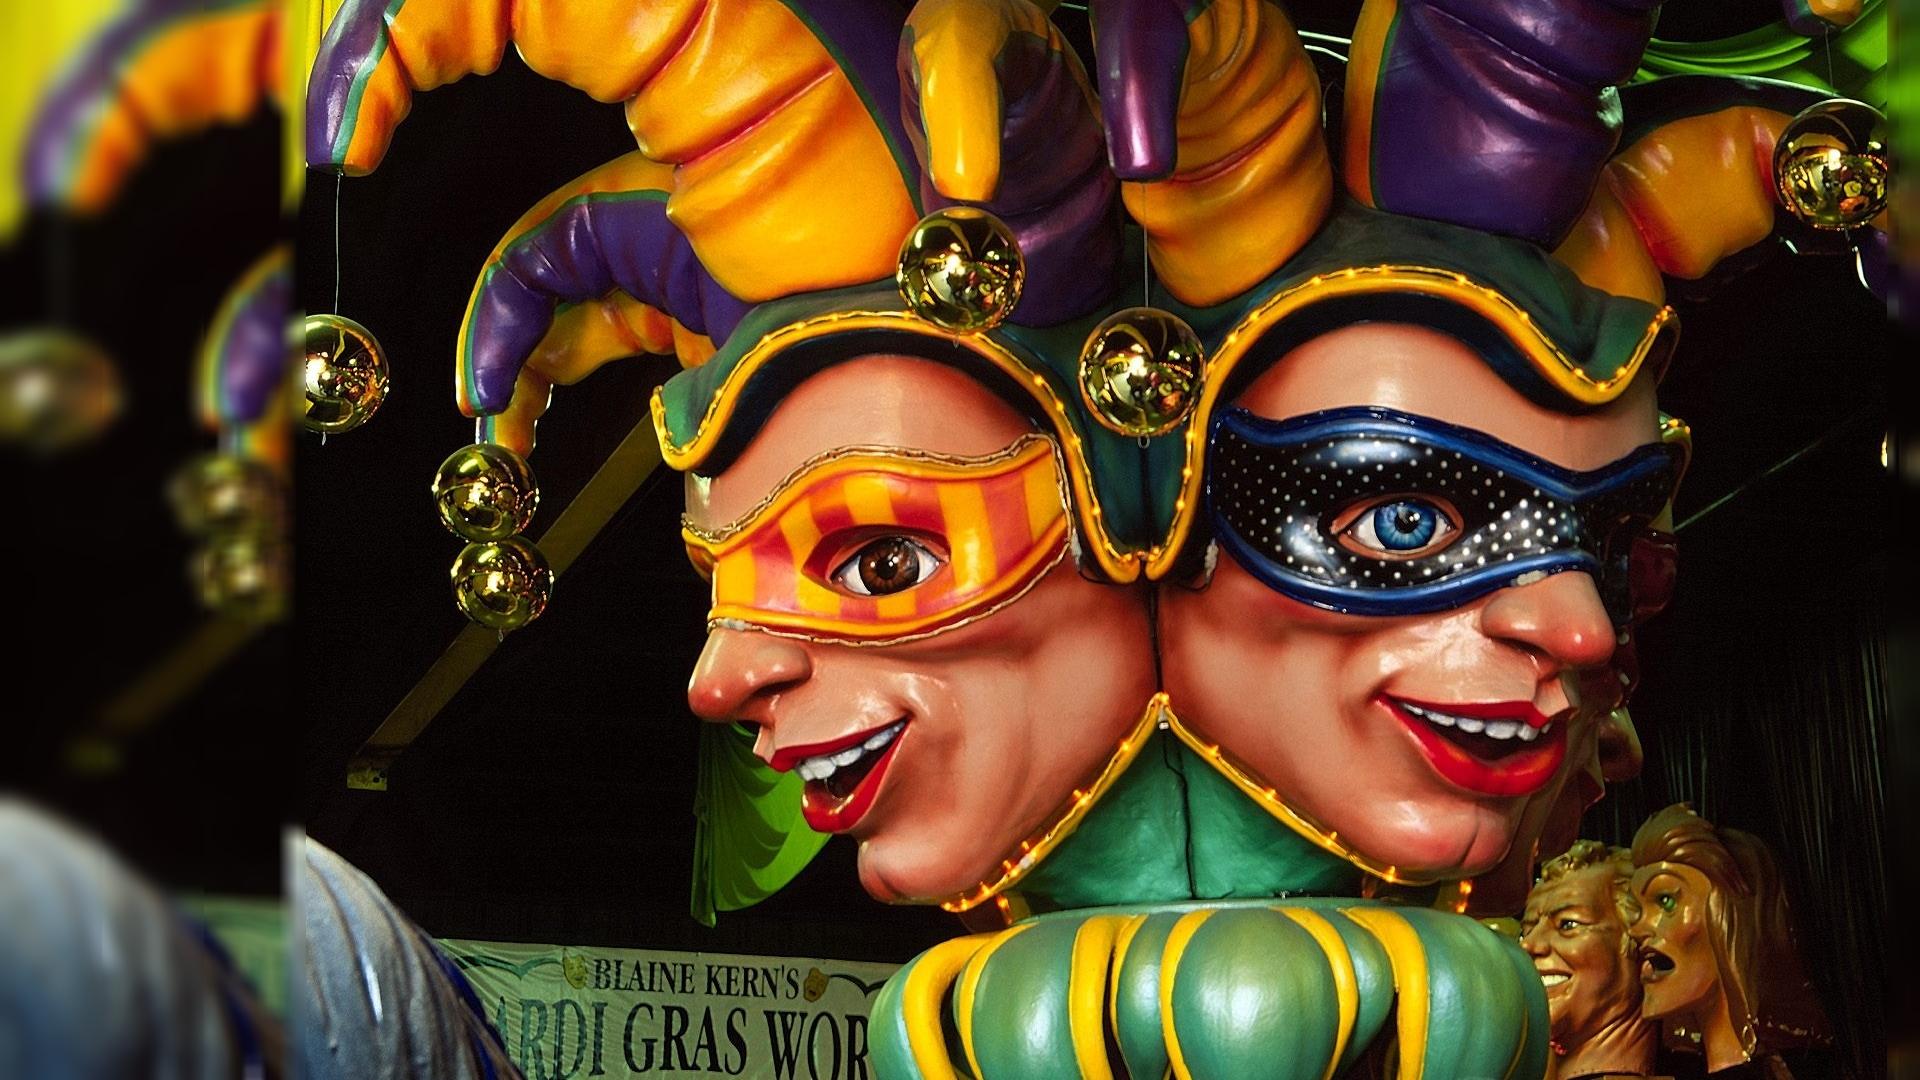 Jokers wallpaper Mardi Gras Jokers hd wallpaper background desktop 1920x1080